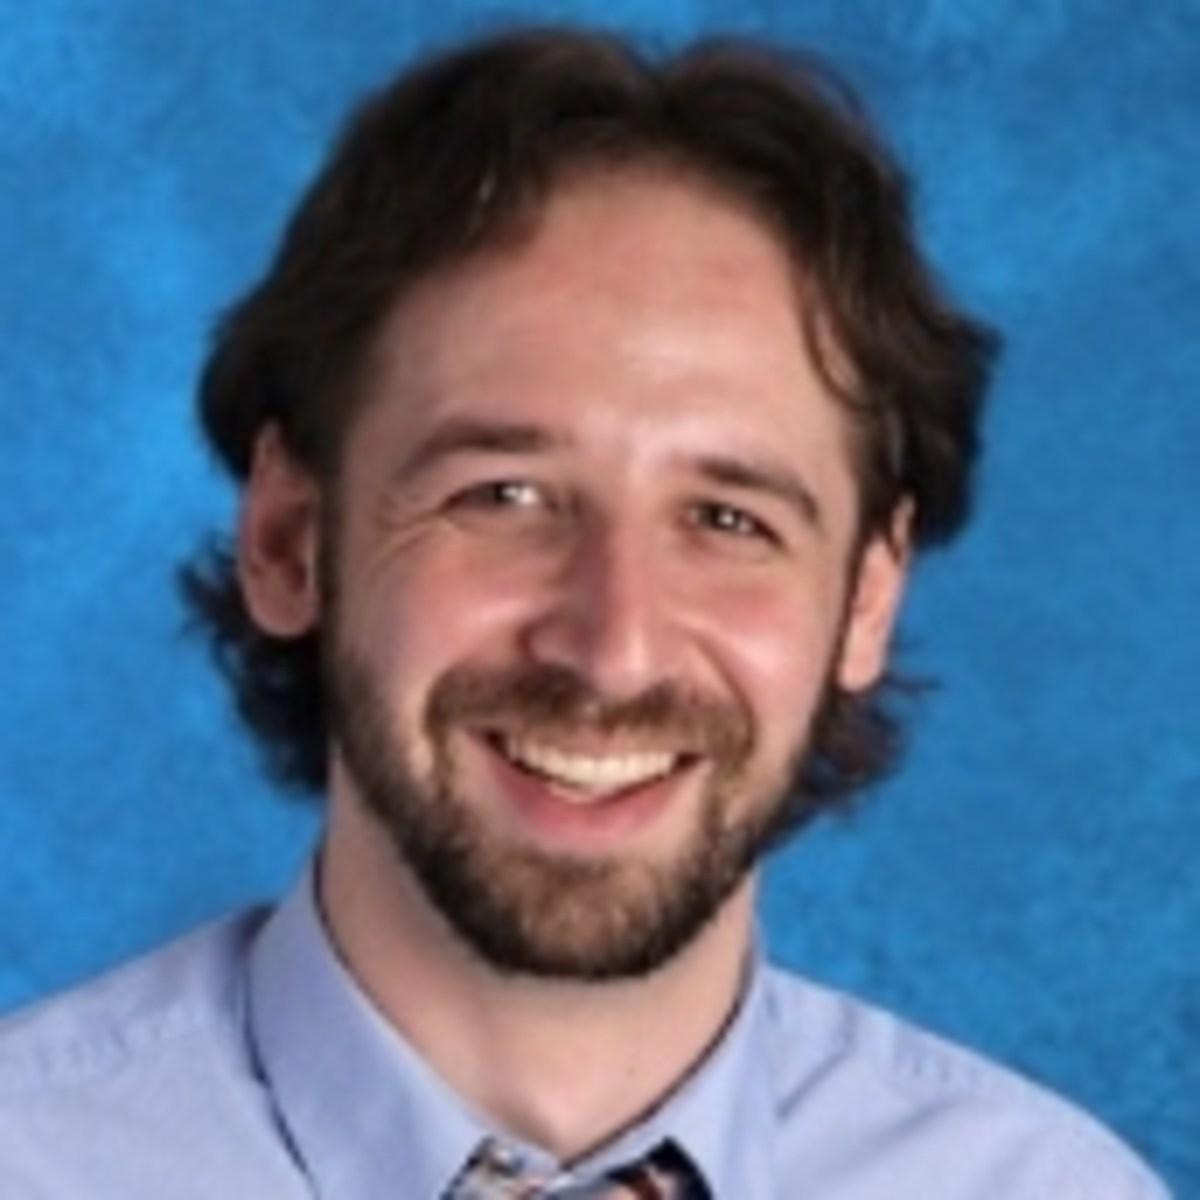 staff high school curriculum arizona school for the arts david kenton s profile photo